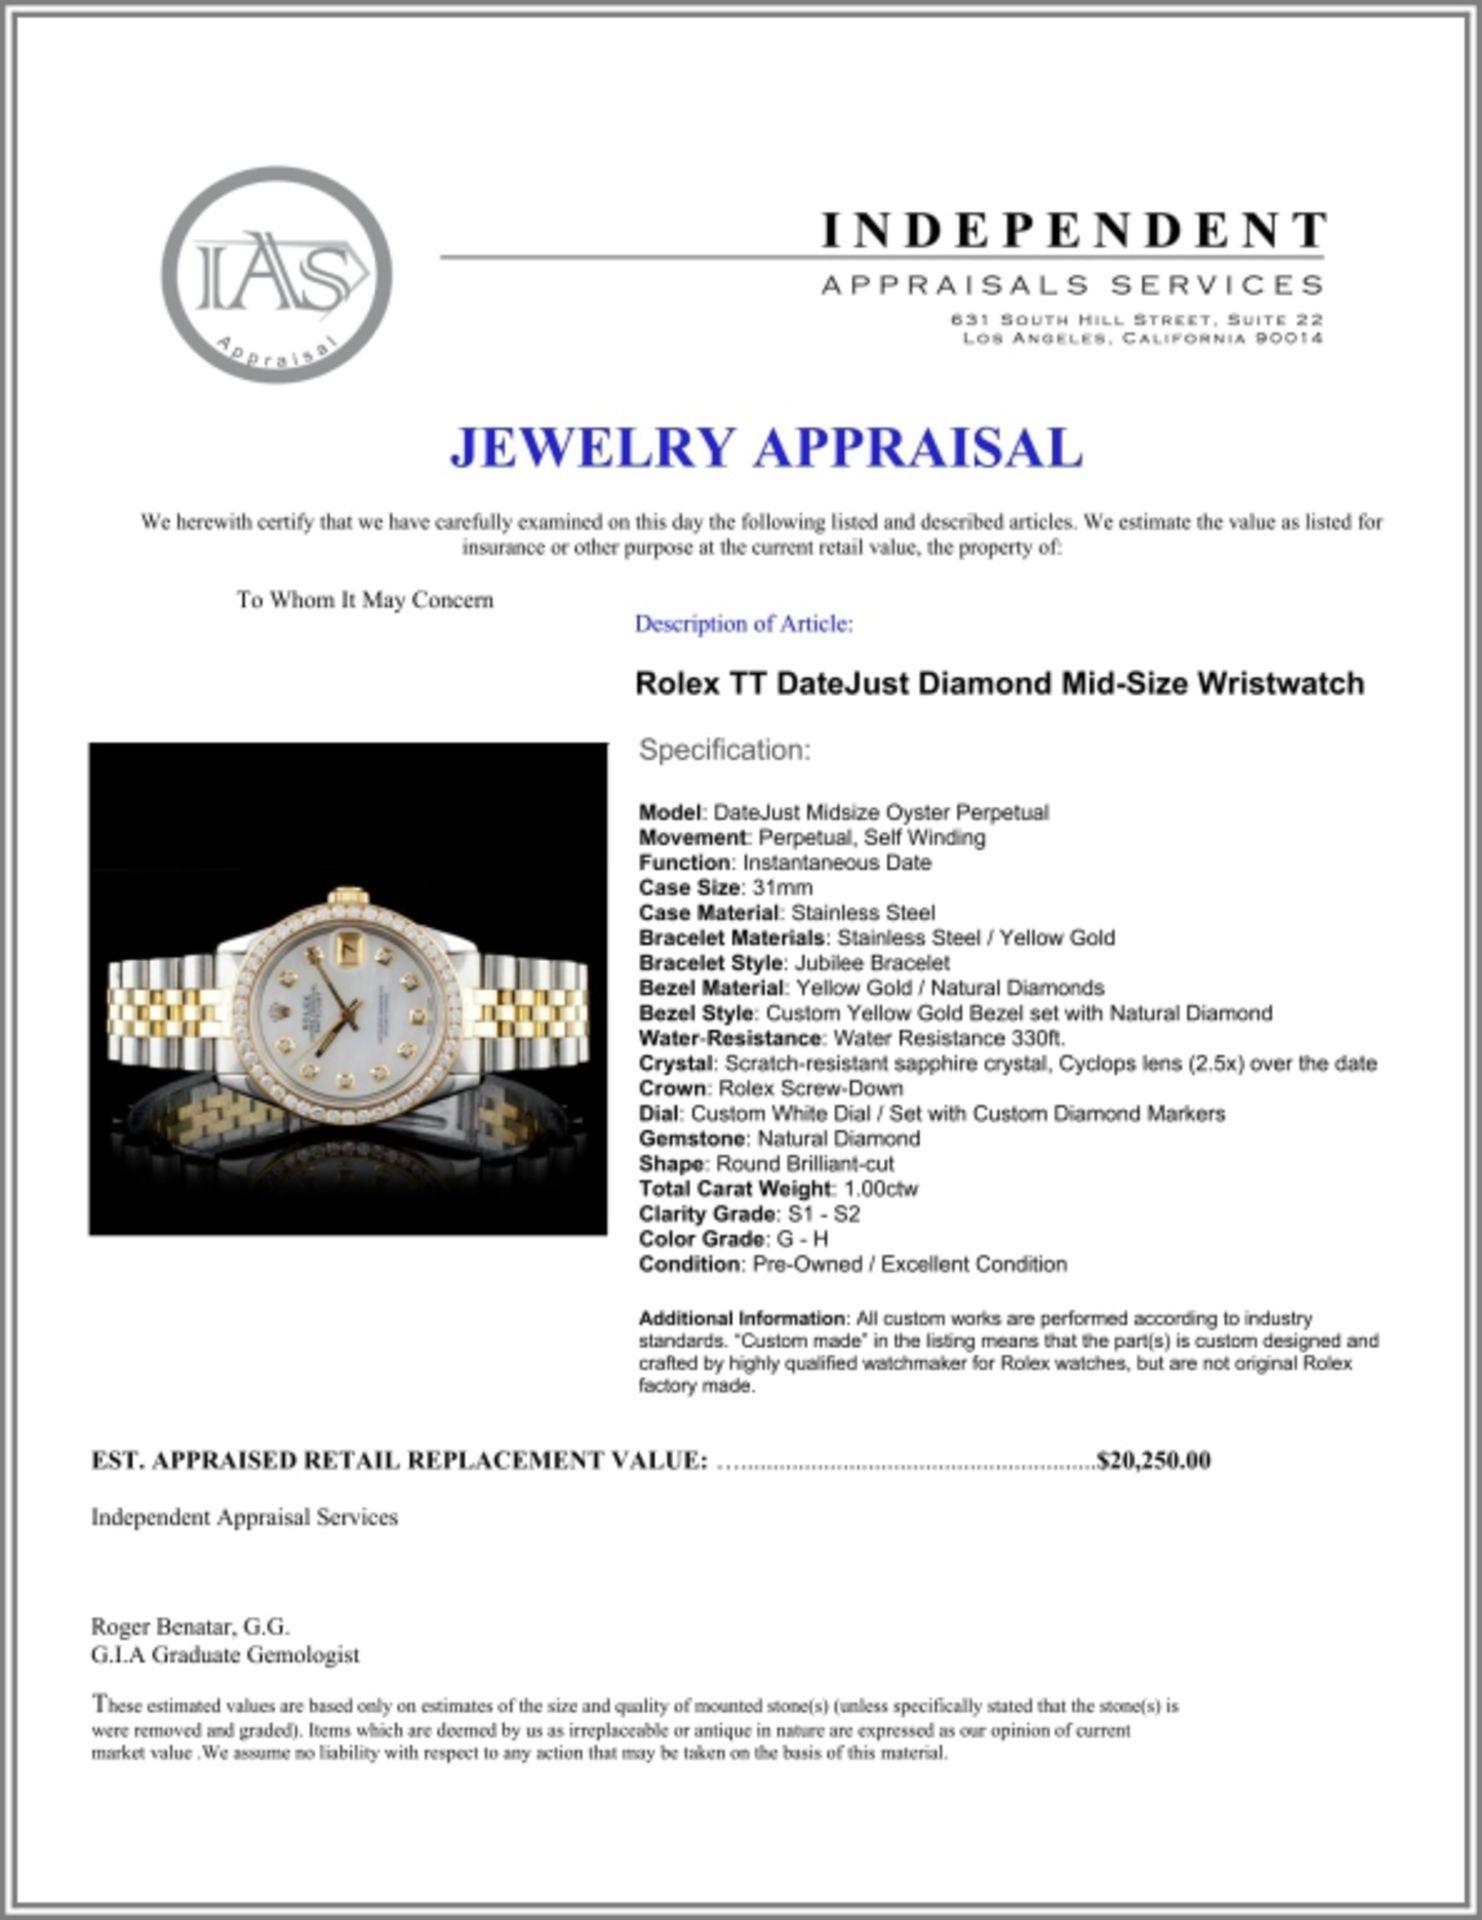 Rolex DateJust Diamond 31mm Wristwatch - Image 5 of 5